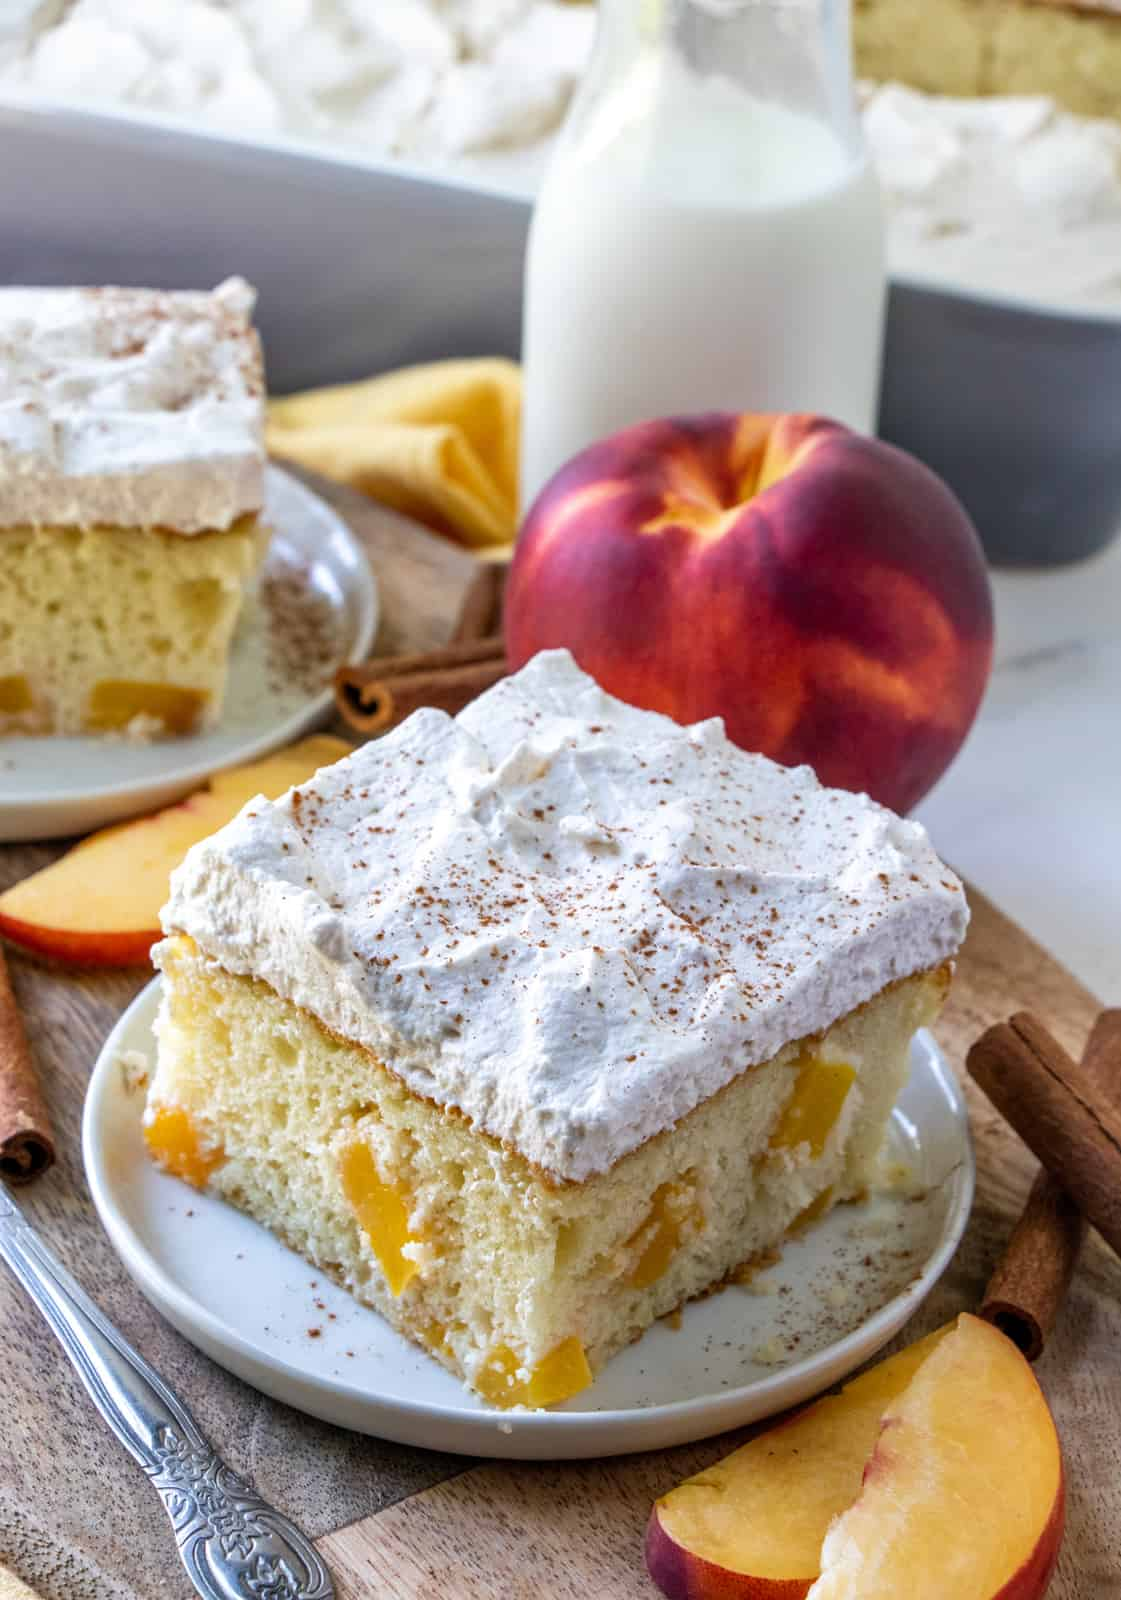 Slice of Peach Cake on white plate sprinkled with ground cinnamon